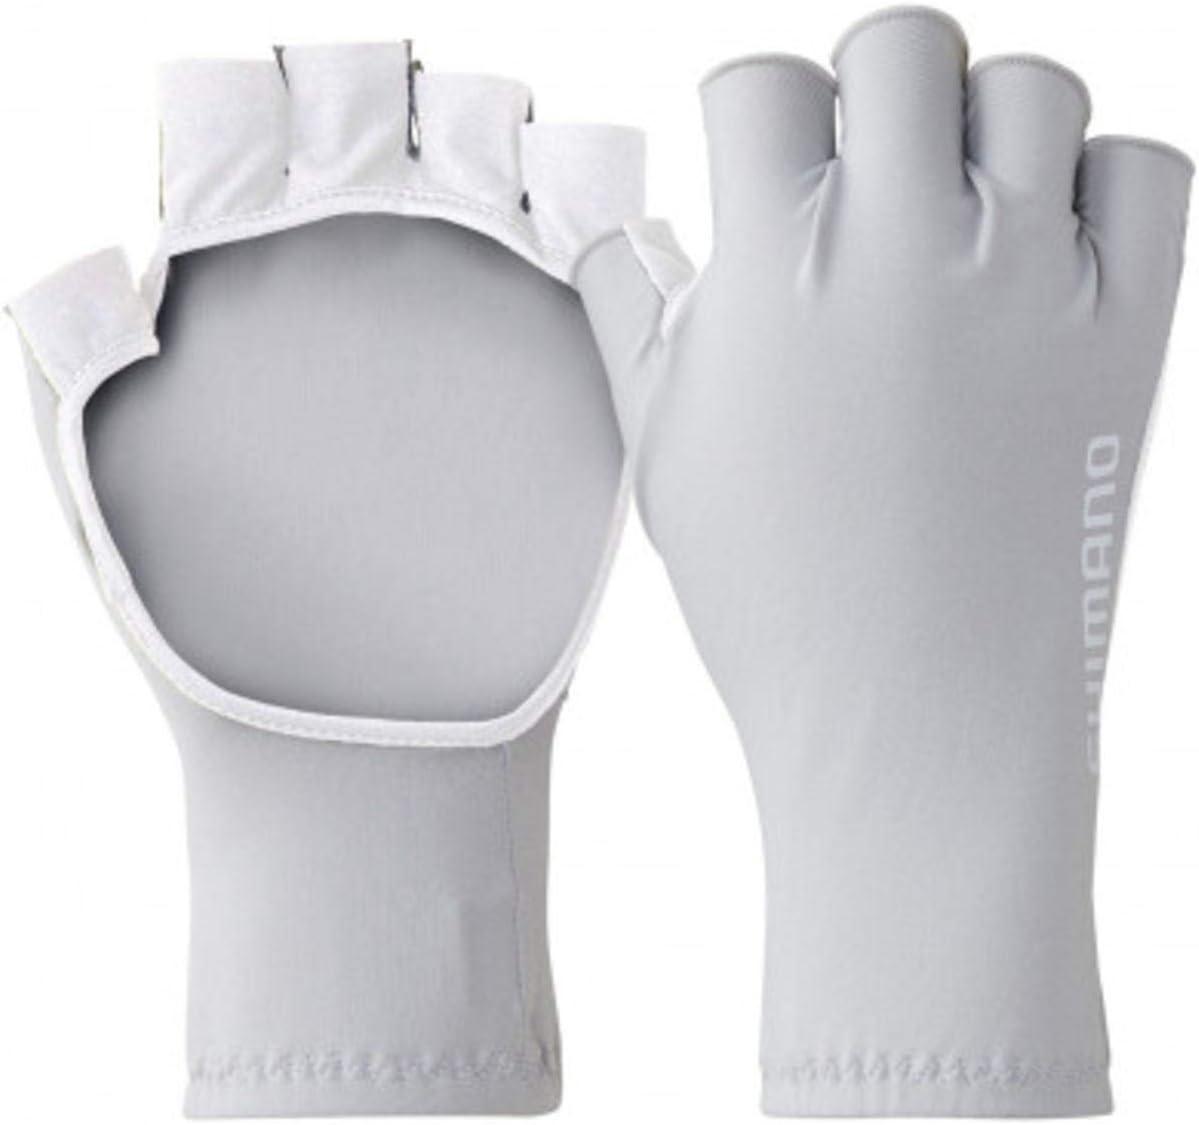 Shimano GL-041C Index Finger Guard Protector Size L Navy 936905